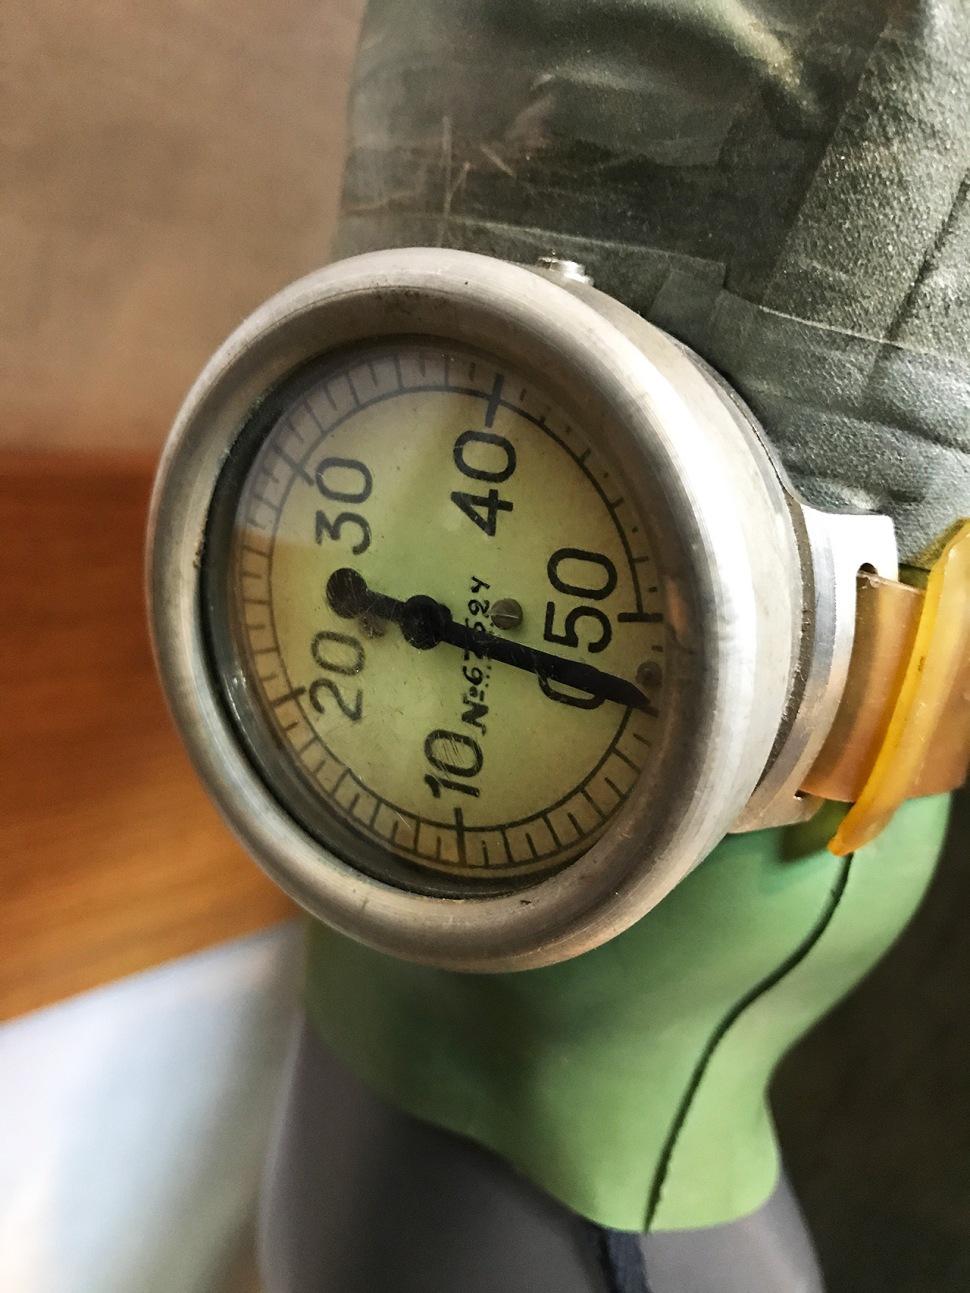 180627-panerai-gtg-moscow-paneristi-club-room-rebreather-IDA-57-depth-gauge